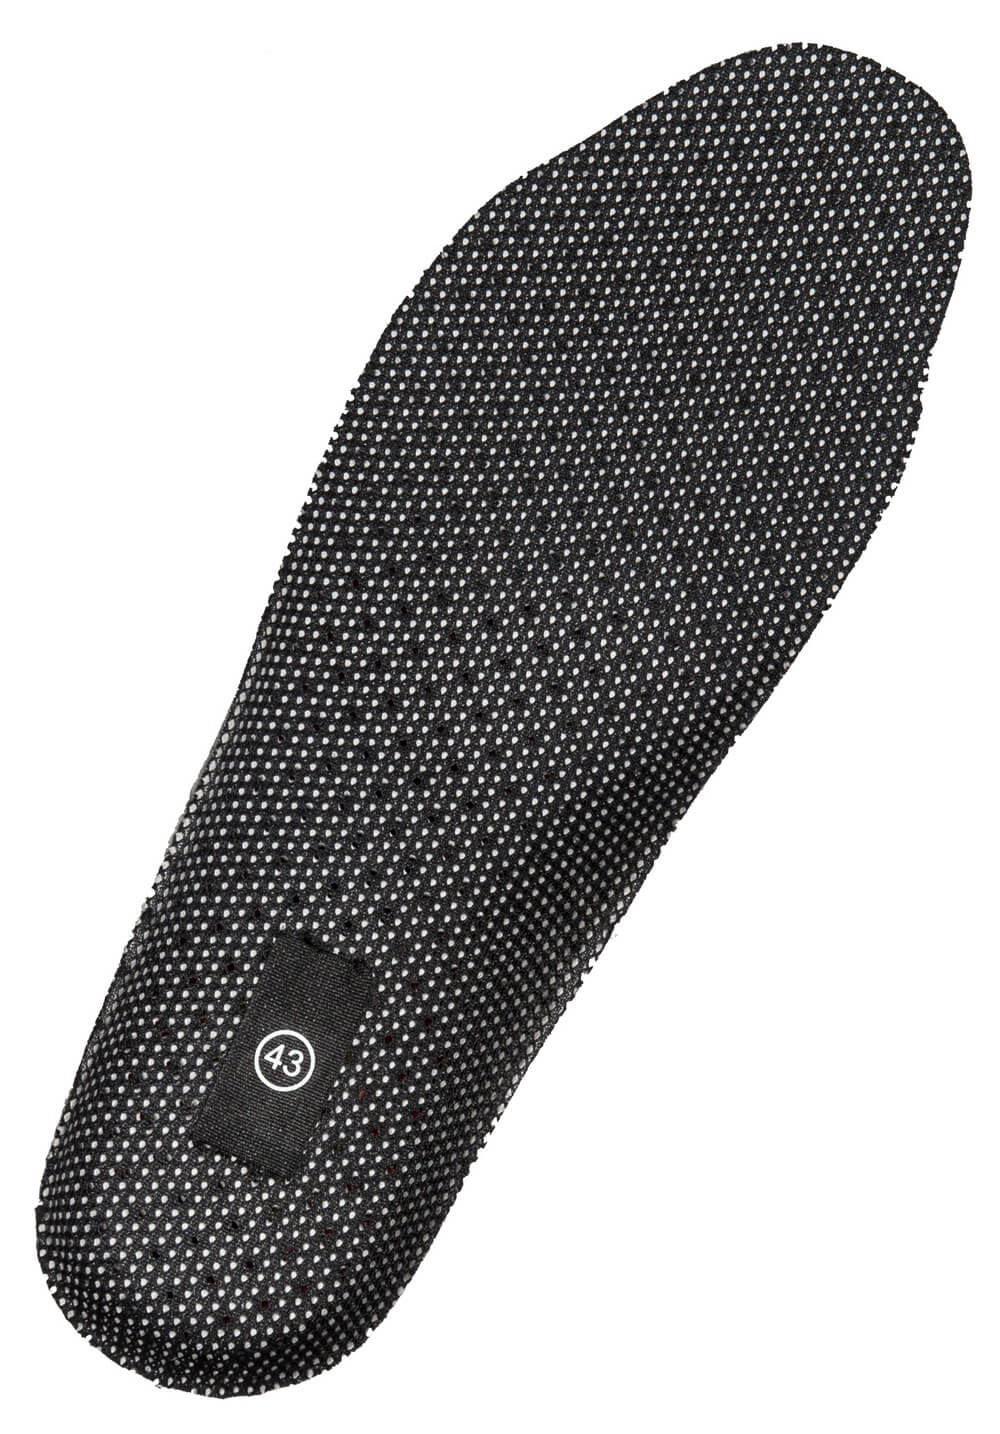 FT086-980-09 Insoles - black